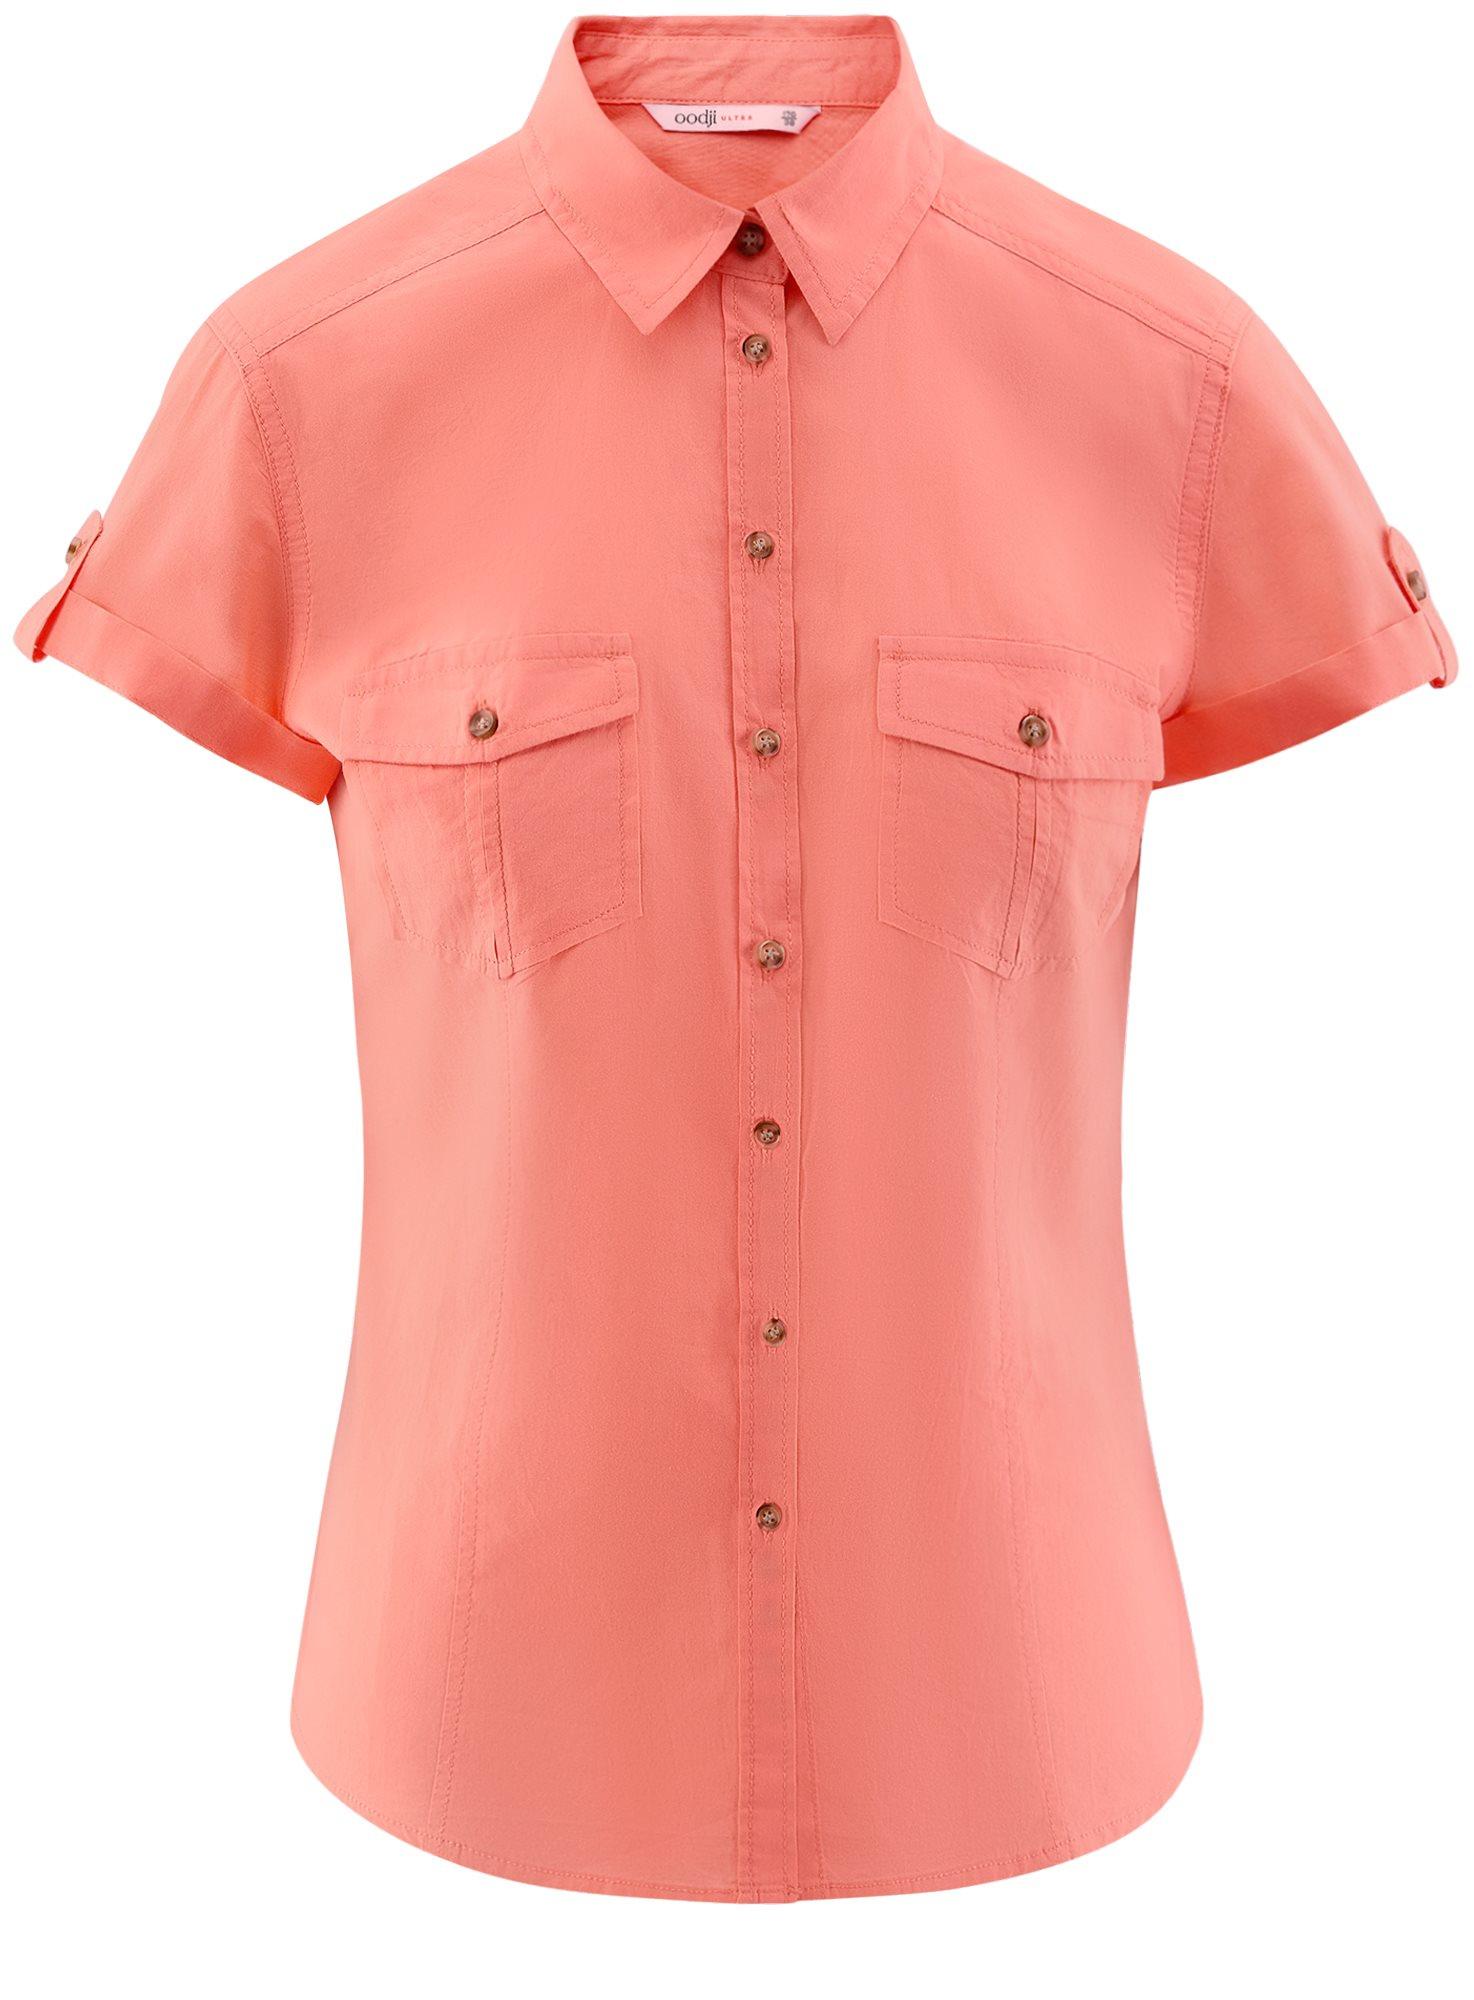 Рубашка базовая с коротким рукавом oodji для женщины (розовый), 11402084-5B/45510/4300N